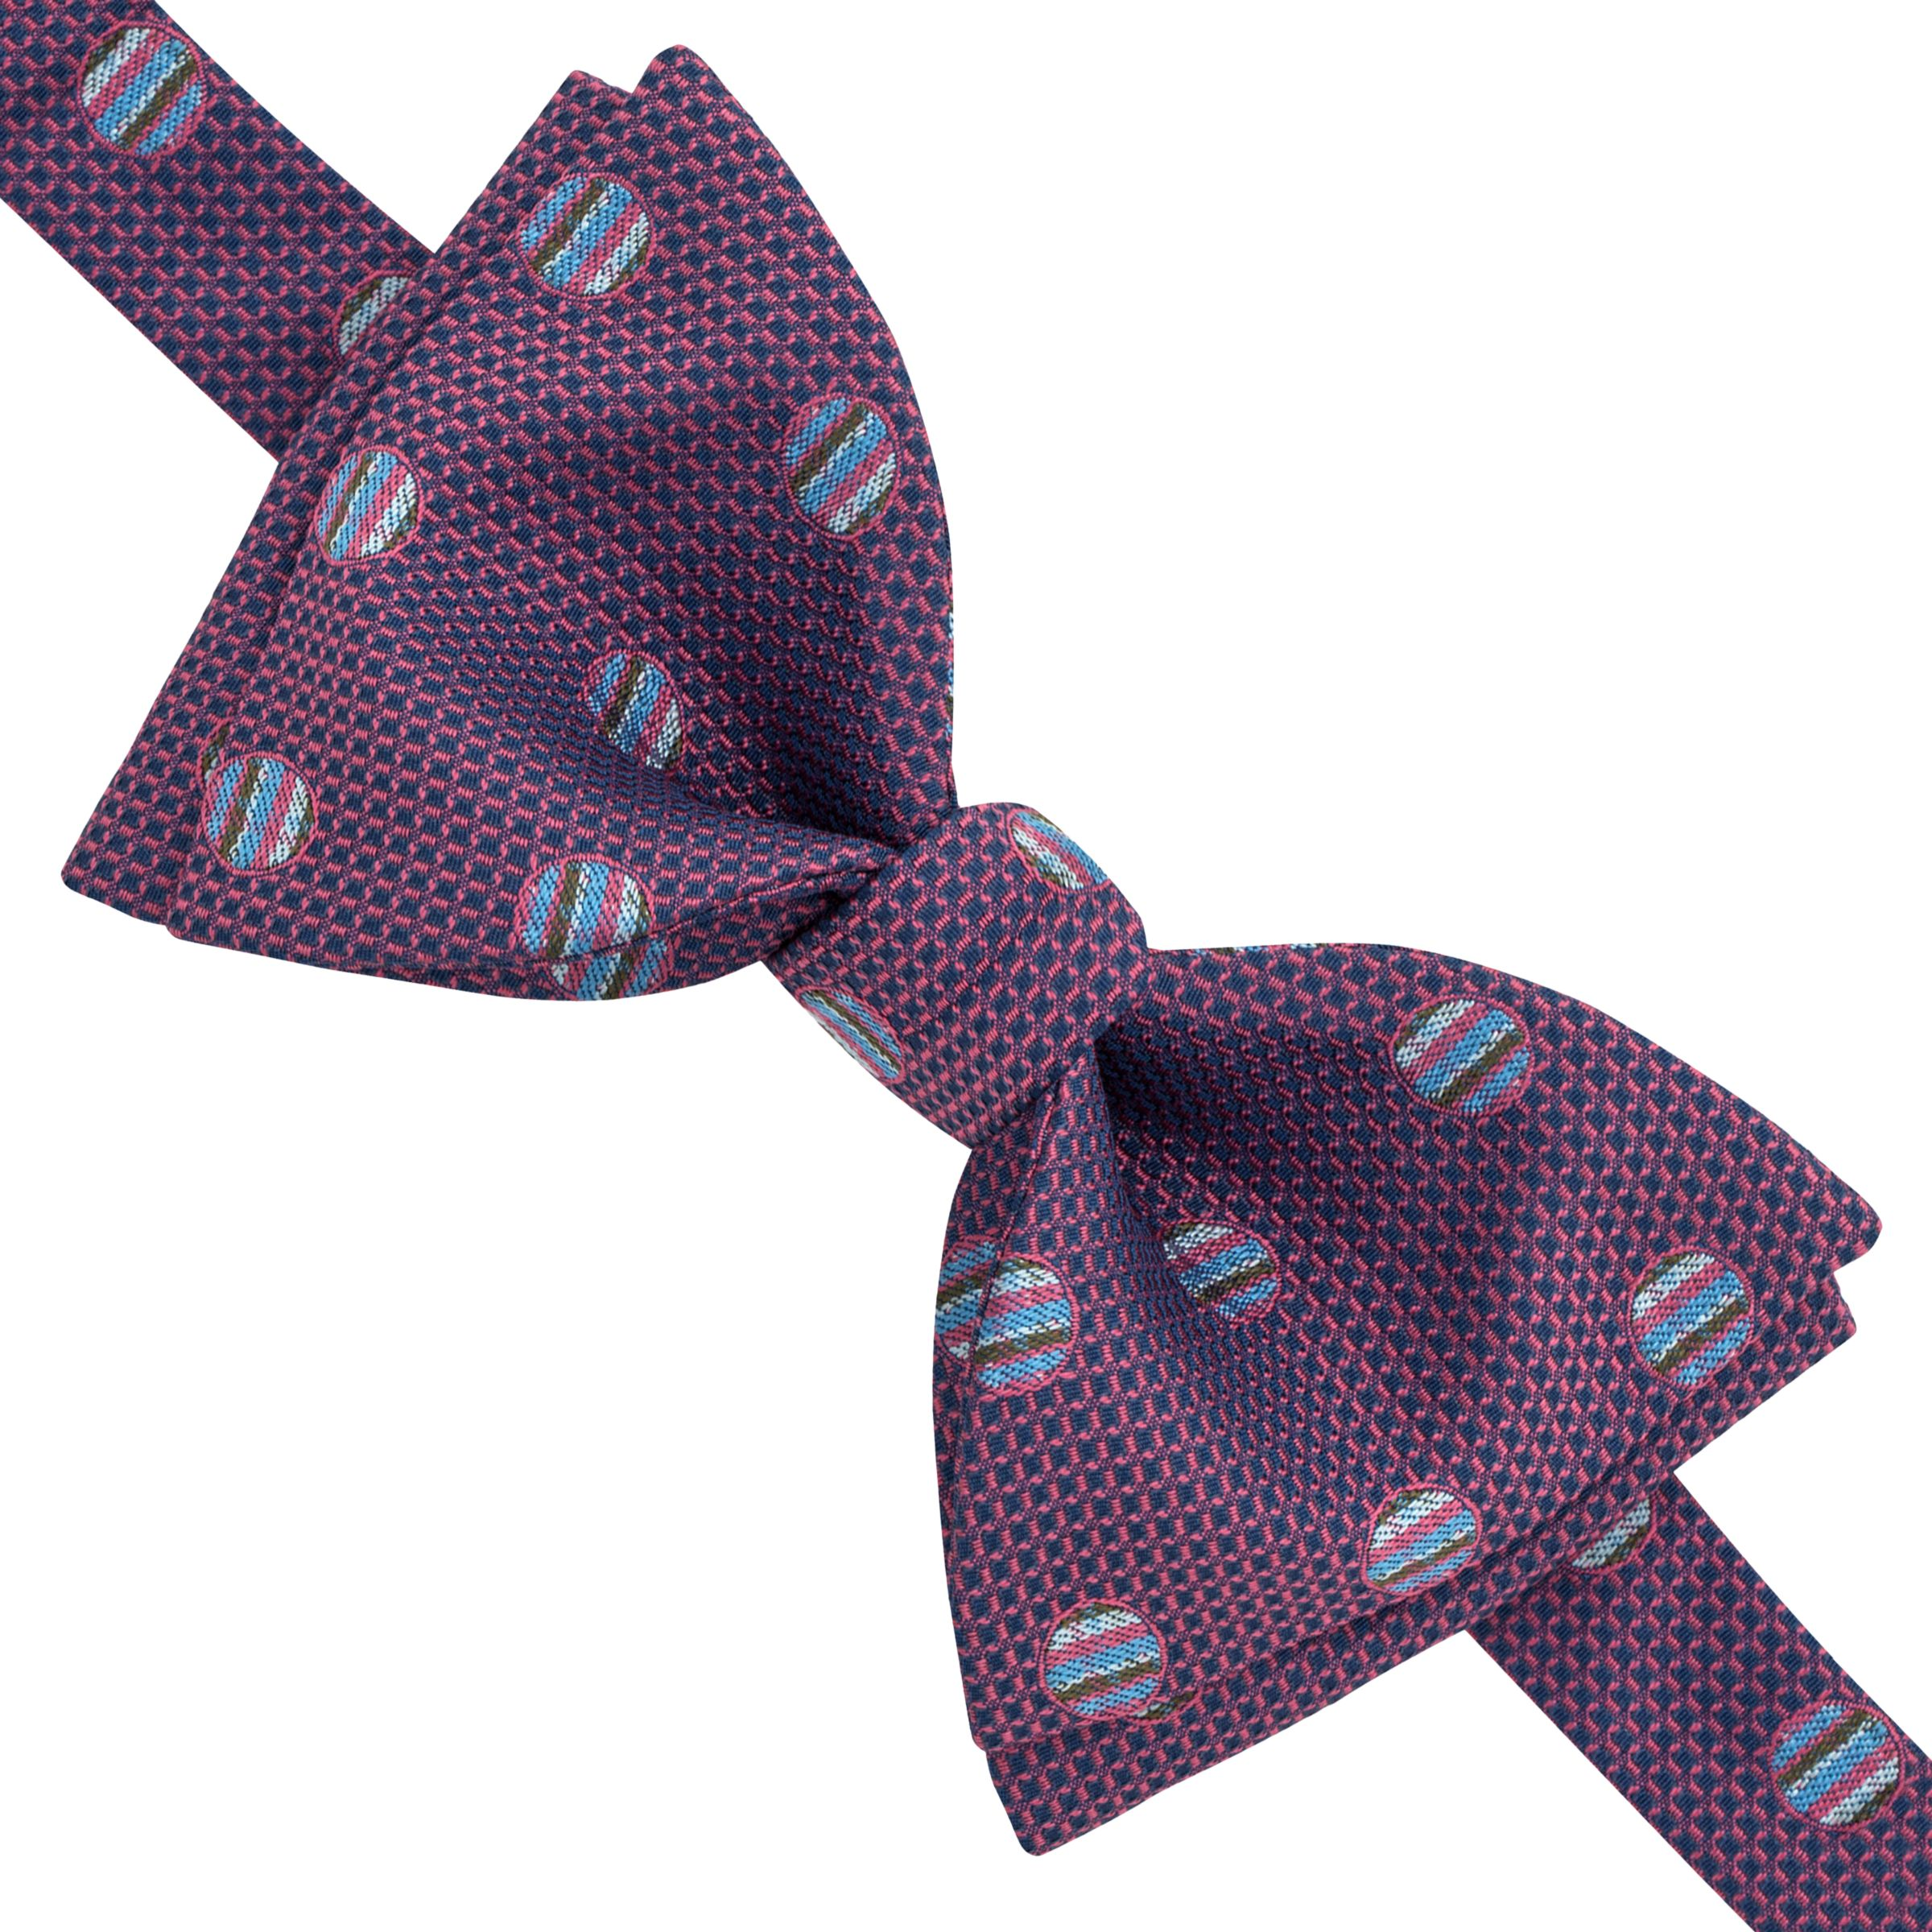 Thomas Pink Thomas Pink Docharty Self Tie Silk Bow Tie, Pink/Blue